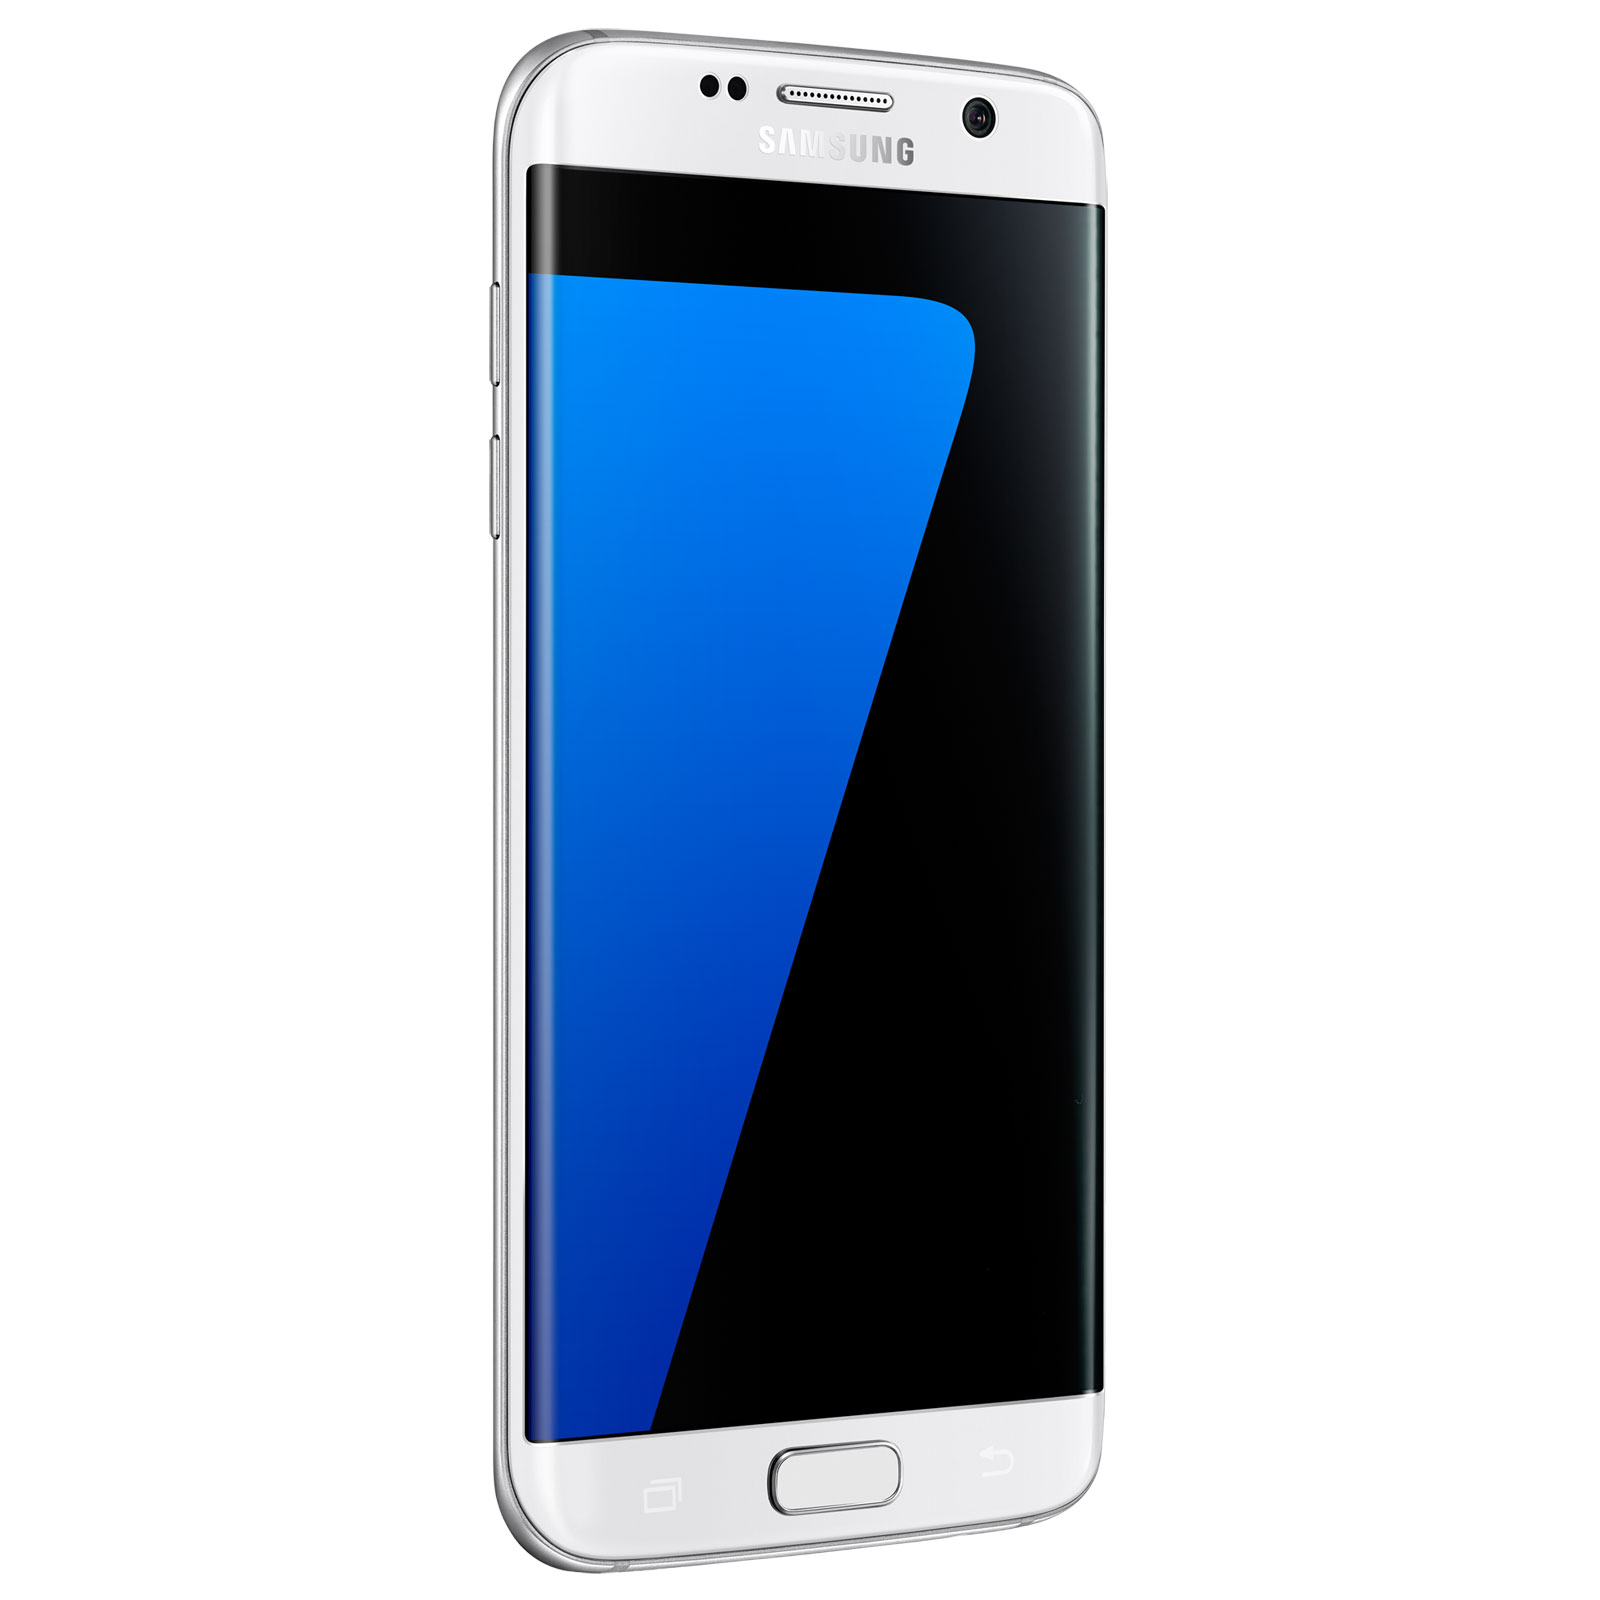 samsung galaxy s7 edge sm g935f blanc 32 go mobile smartphone samsung sur. Black Bedroom Furniture Sets. Home Design Ideas